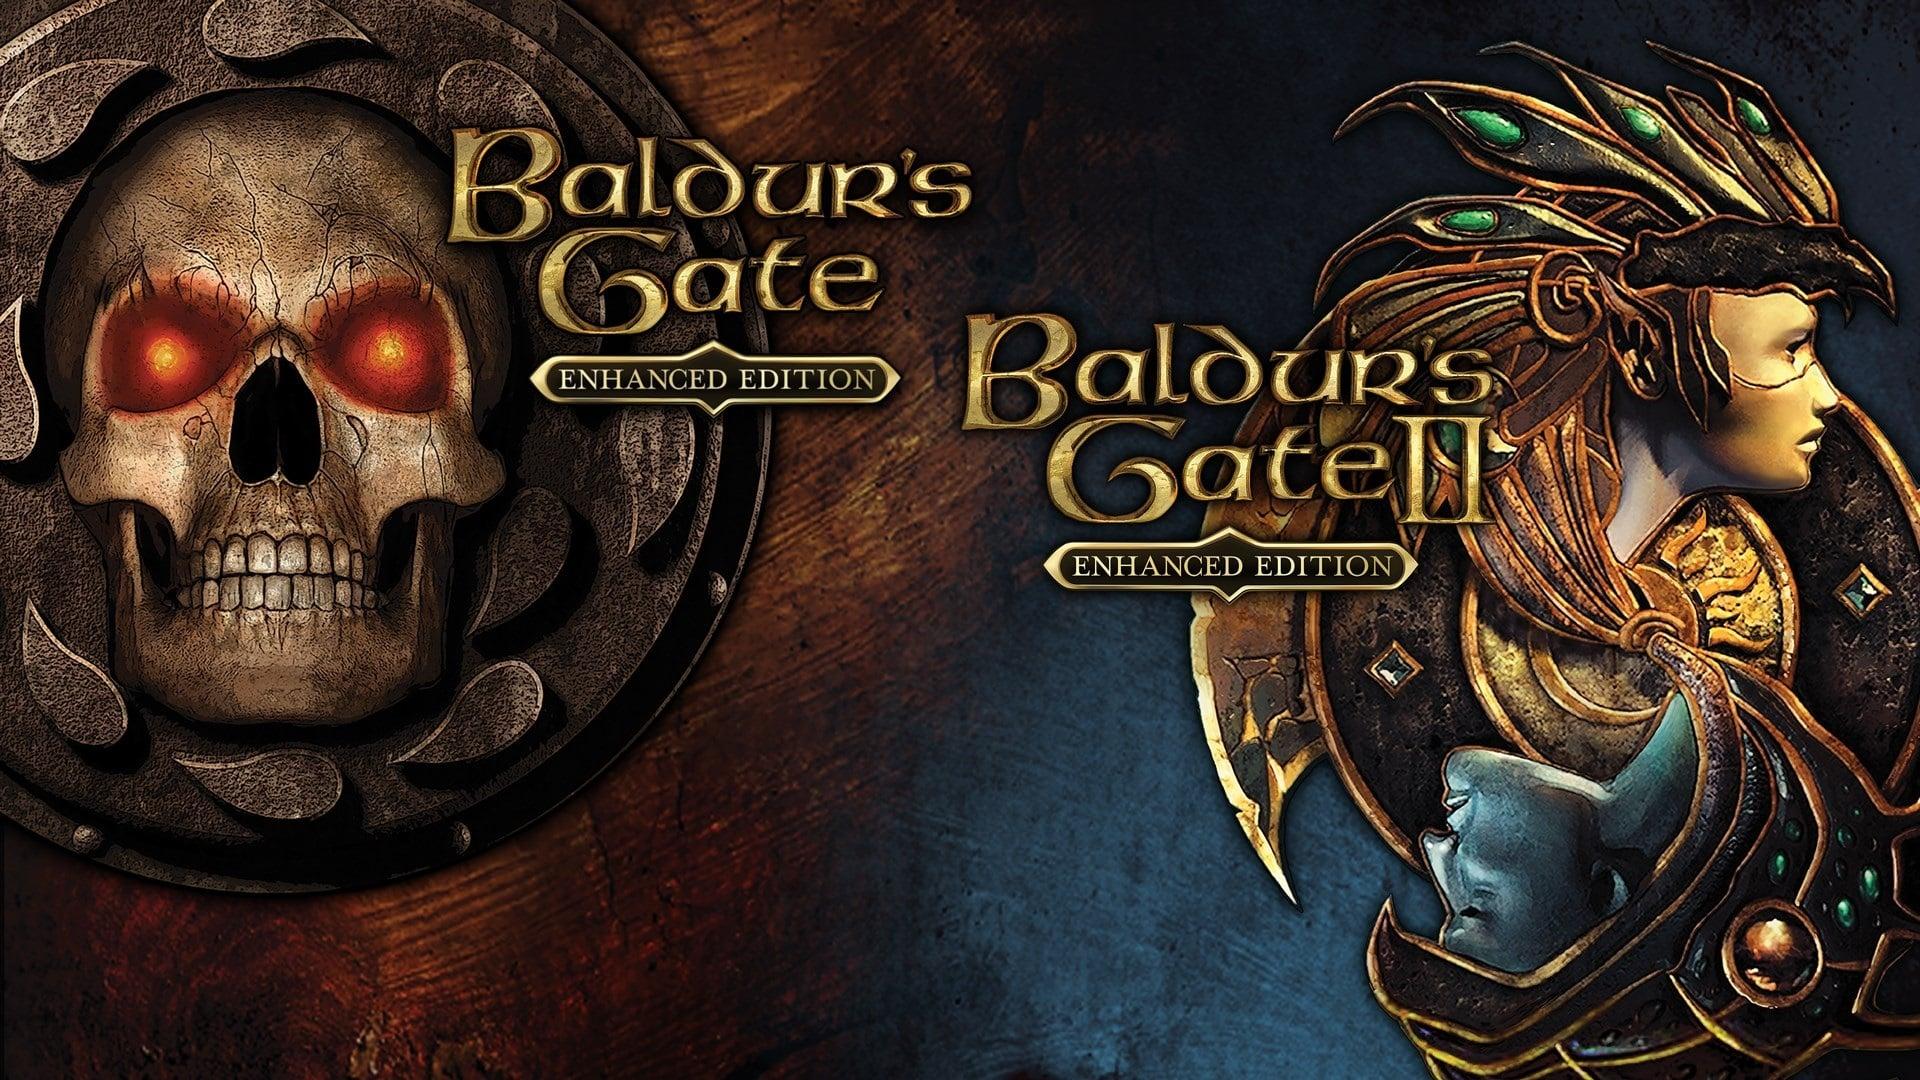 171 Achievements Revealed For Baldurs Gate And Baldurs